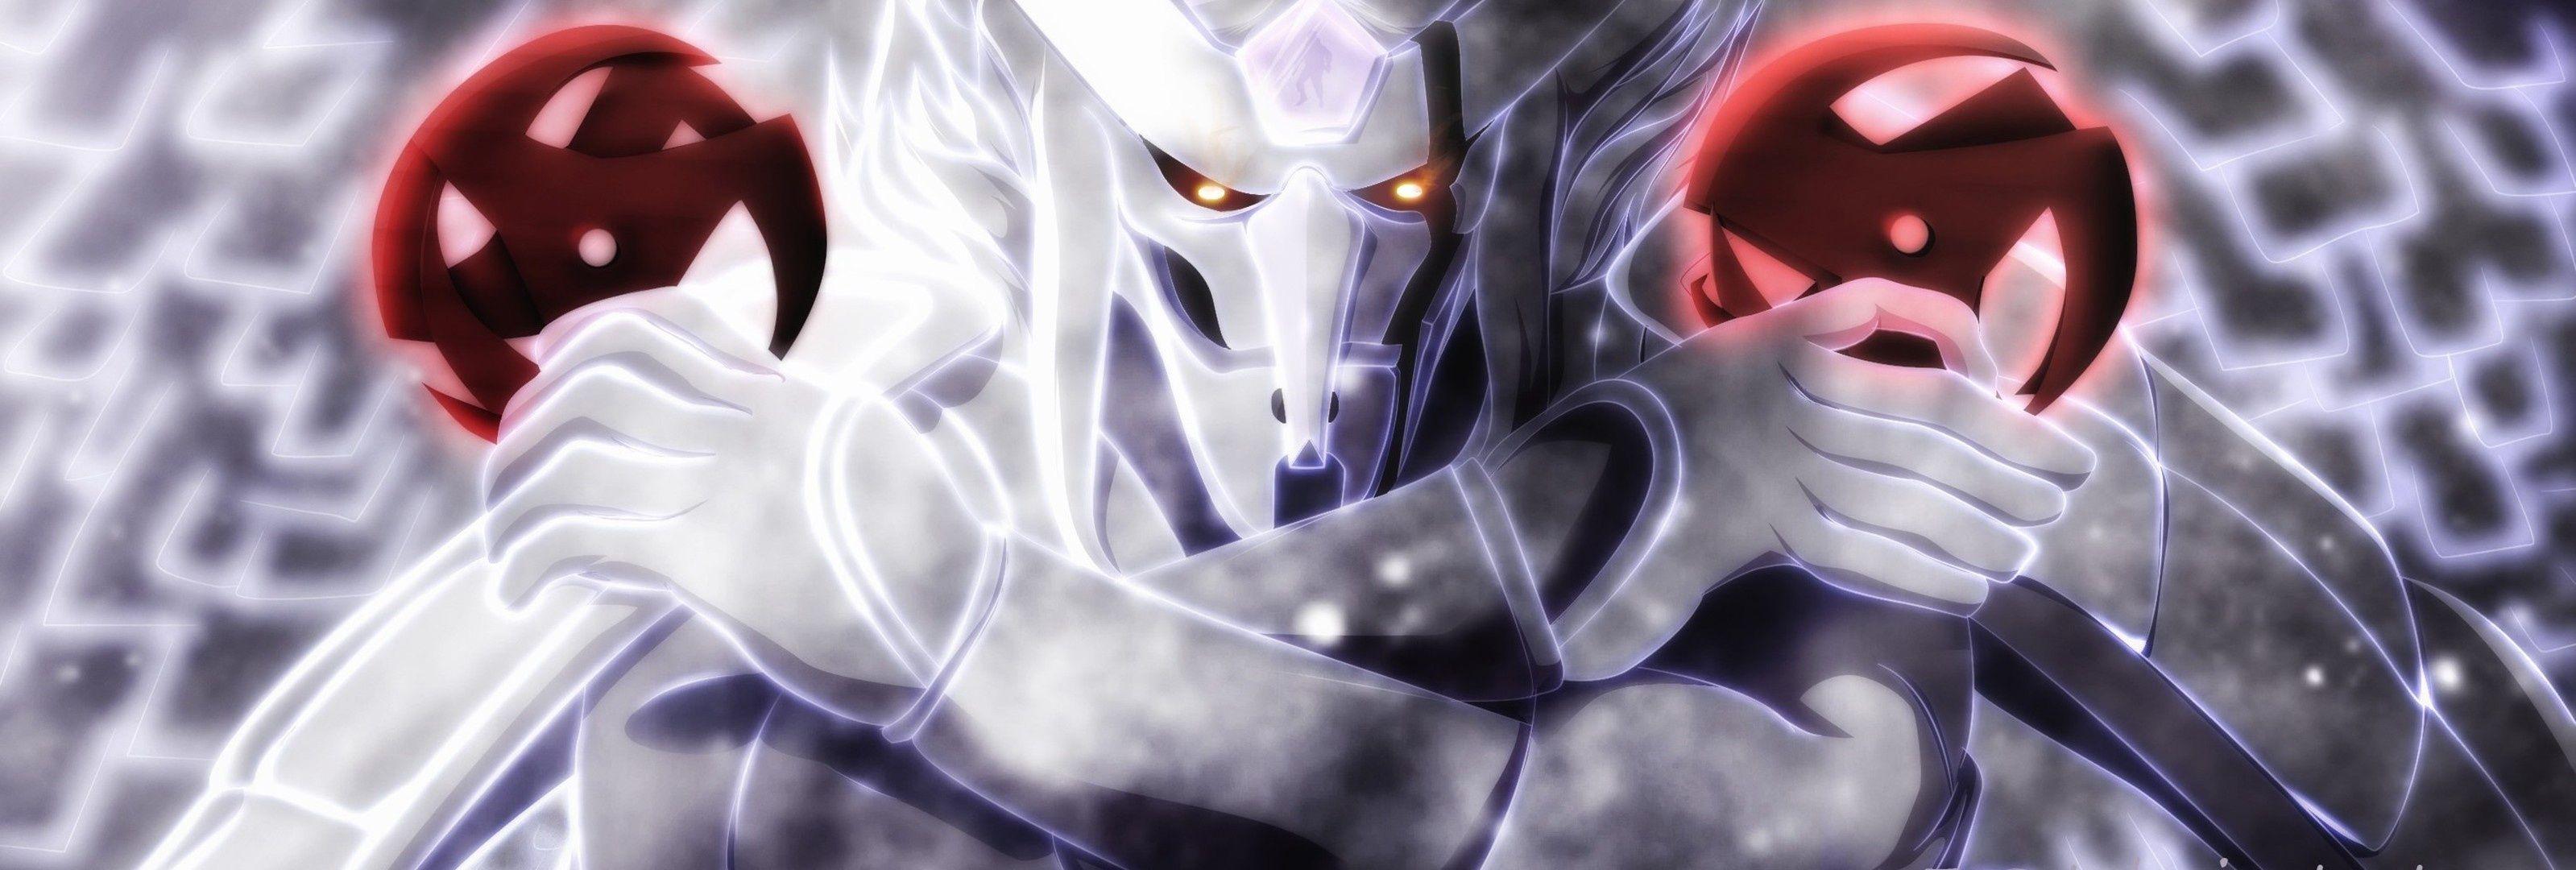 Anime Naruto Susanoo Wallpaper